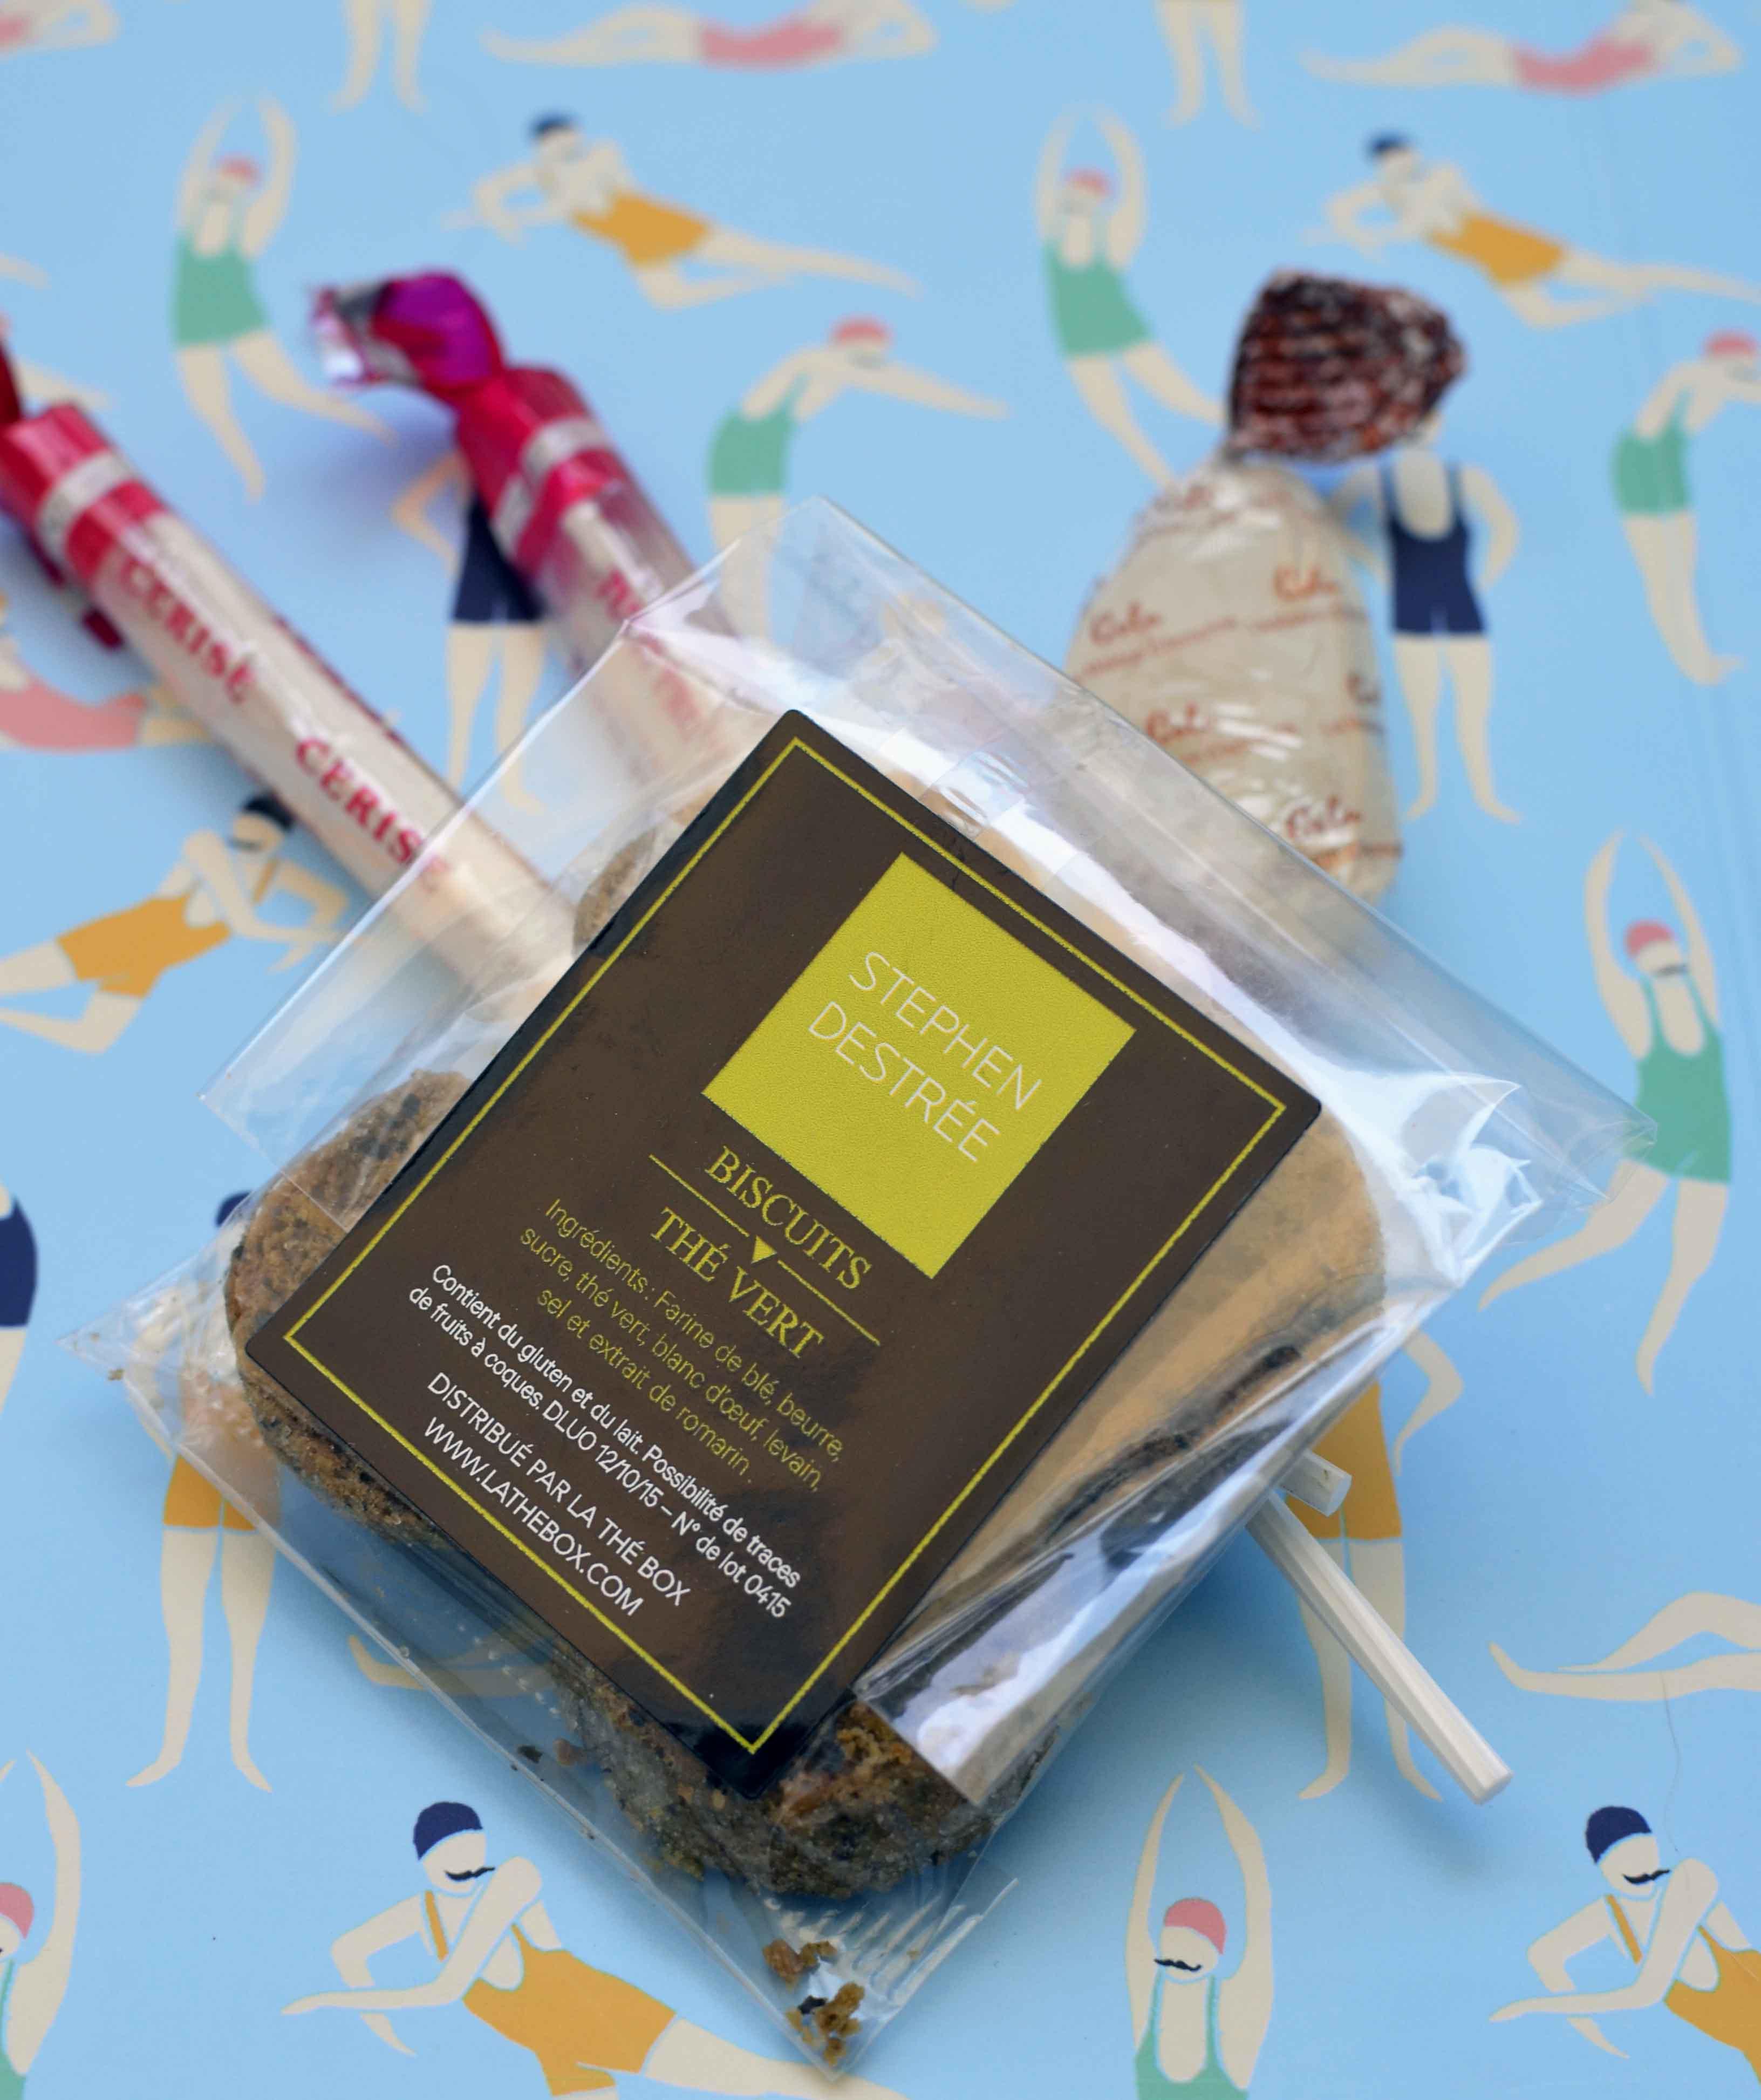 thé box splash juillet 2015